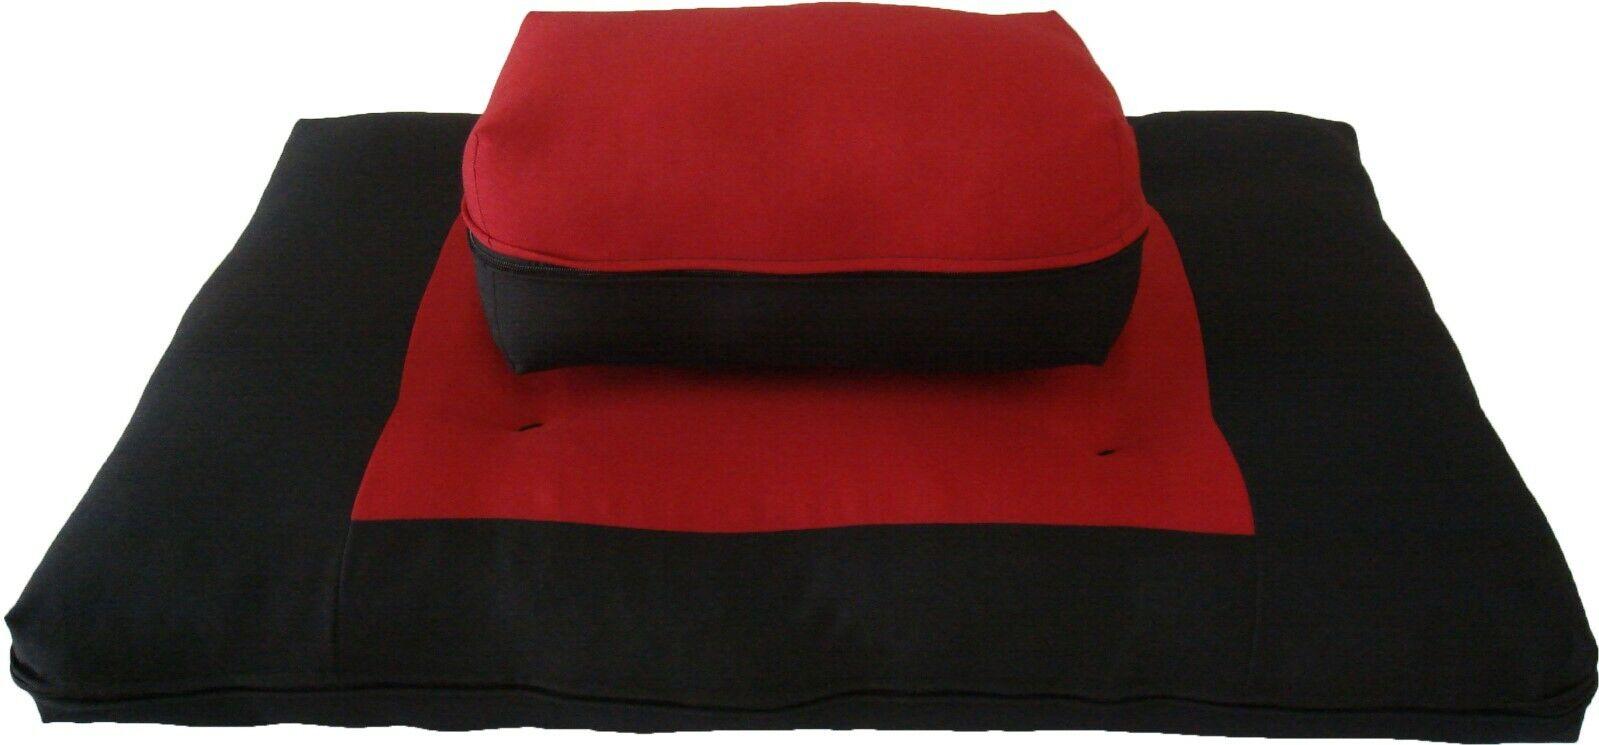 Zafu Zabuton Set, Relaxing Yoga Meditation Cotton Cushions, Mats Black/Red